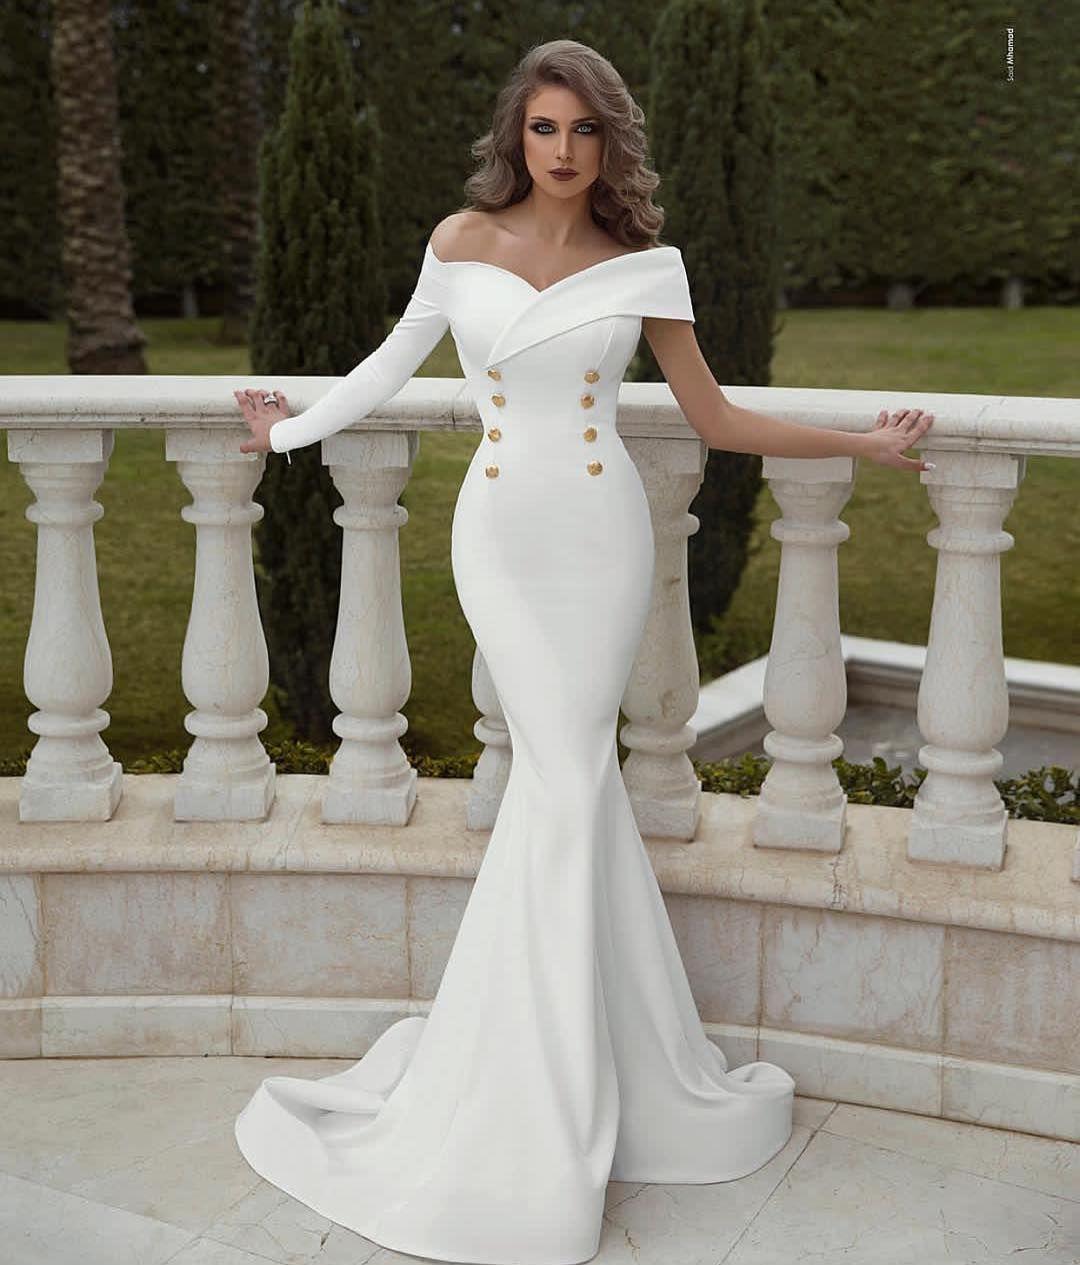 1 714 Vind Ik Leuks 27 Reacties Haute Couture Inspiration Hautecouture Inspiration Op Inst Wedding Dress Guide Wedding Dresses Simple Evening Party Gowns [ 1265 x 1080 Pixel ]